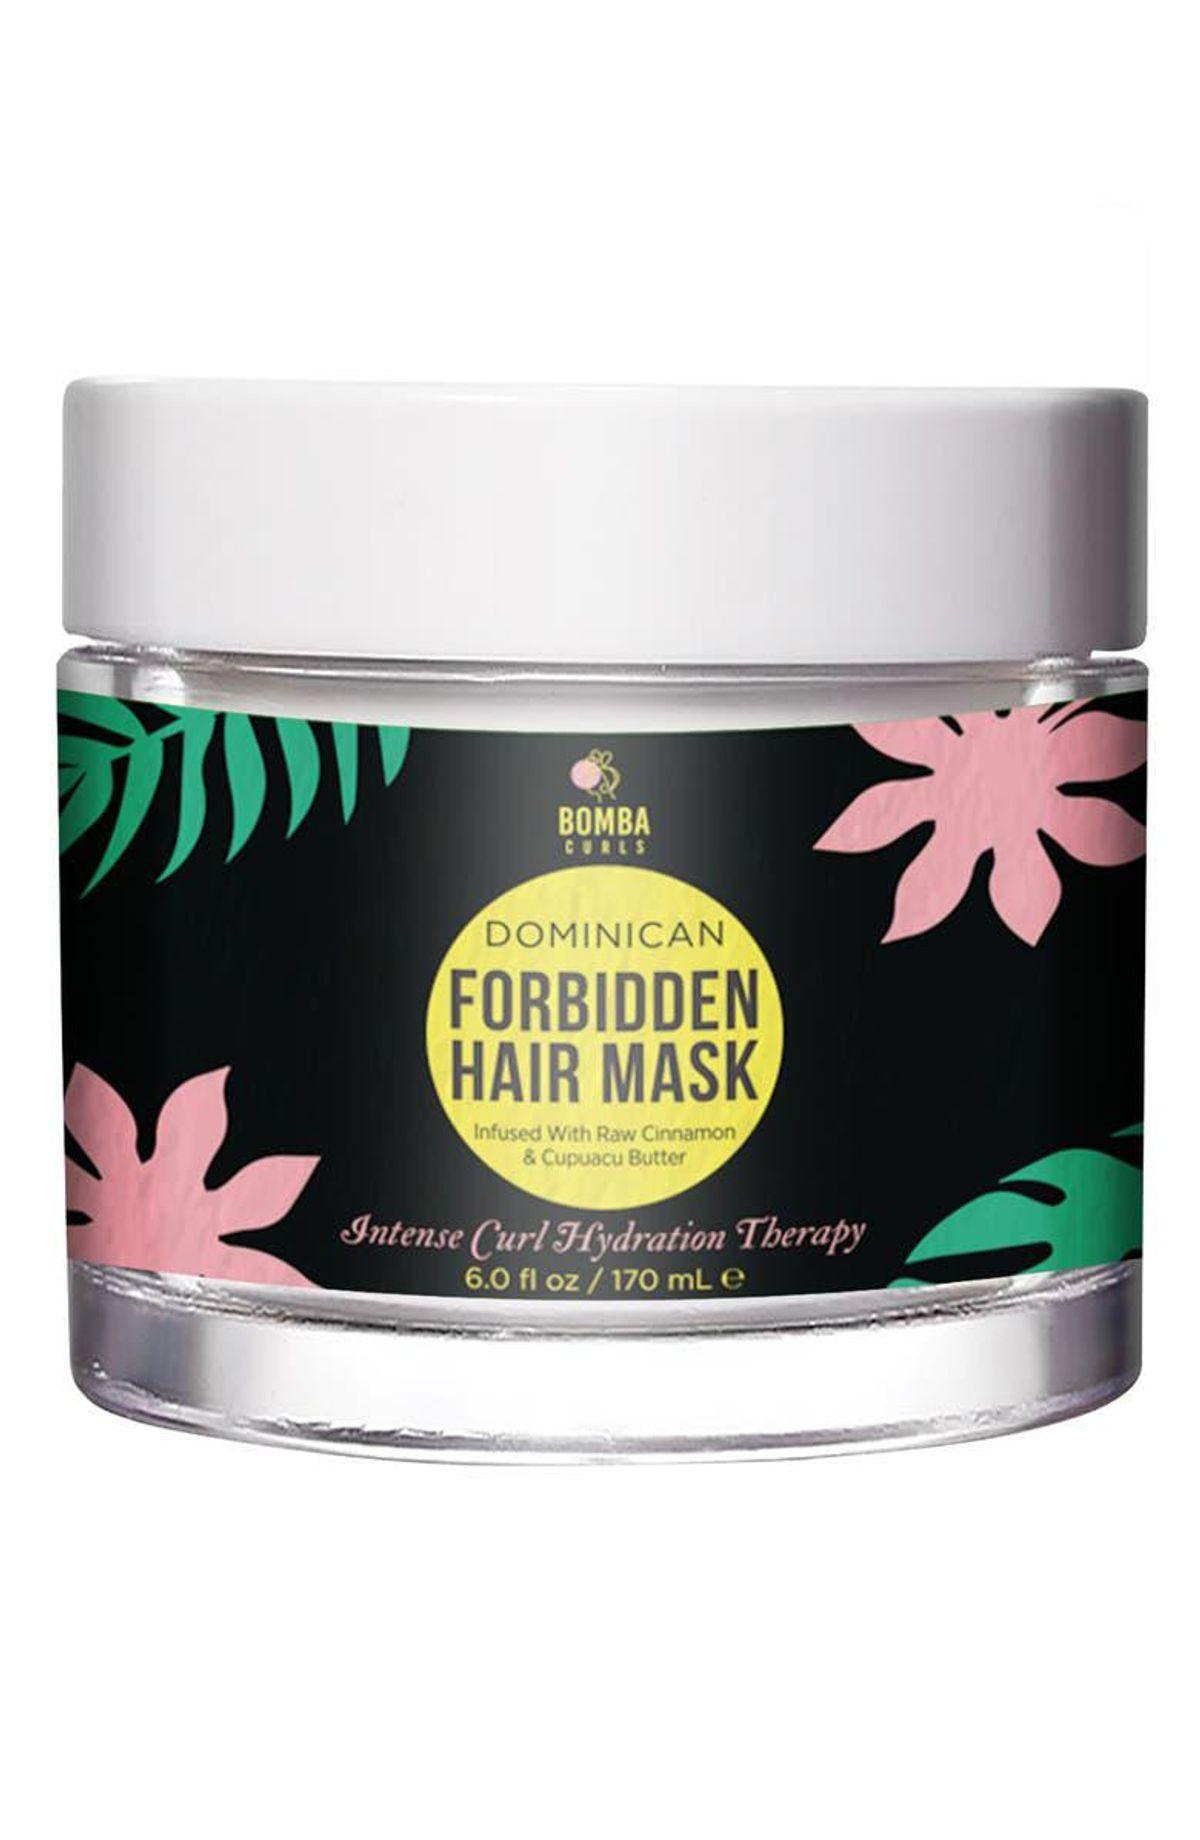 Dominican Forbidden Hair Mask